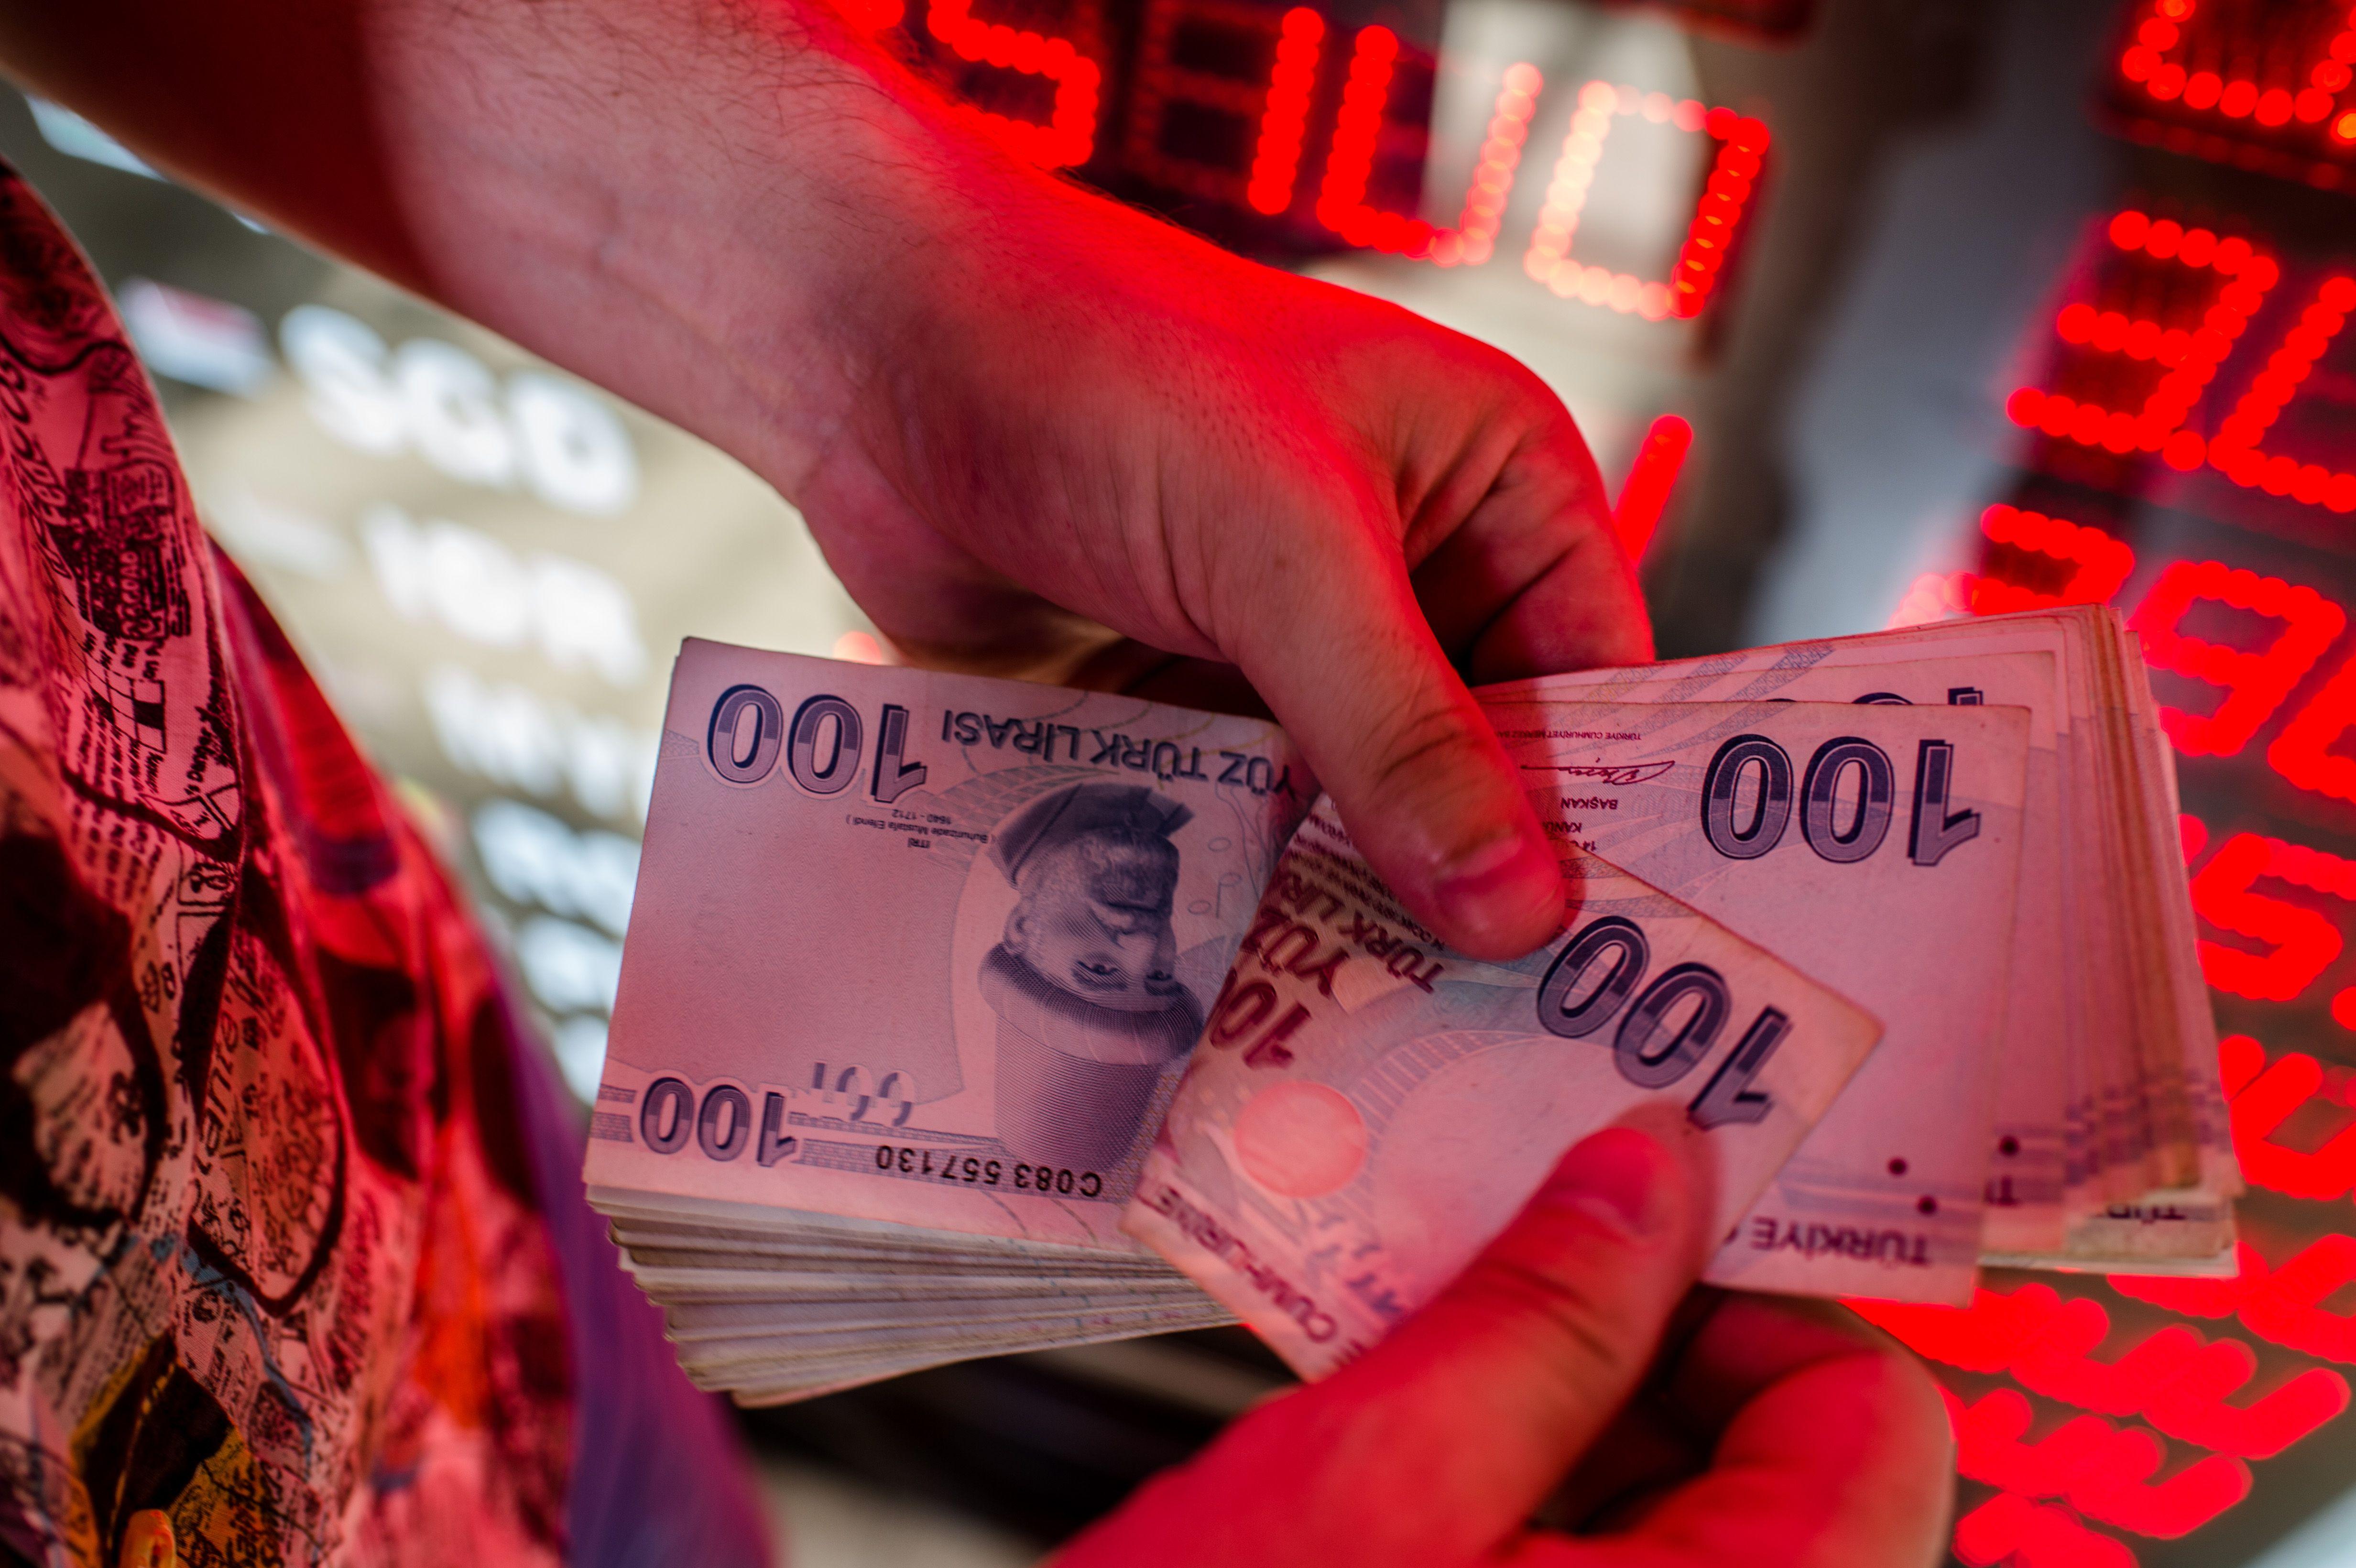 Turkey Probes JPMorgan After Lira's Worst Slide Since 2018